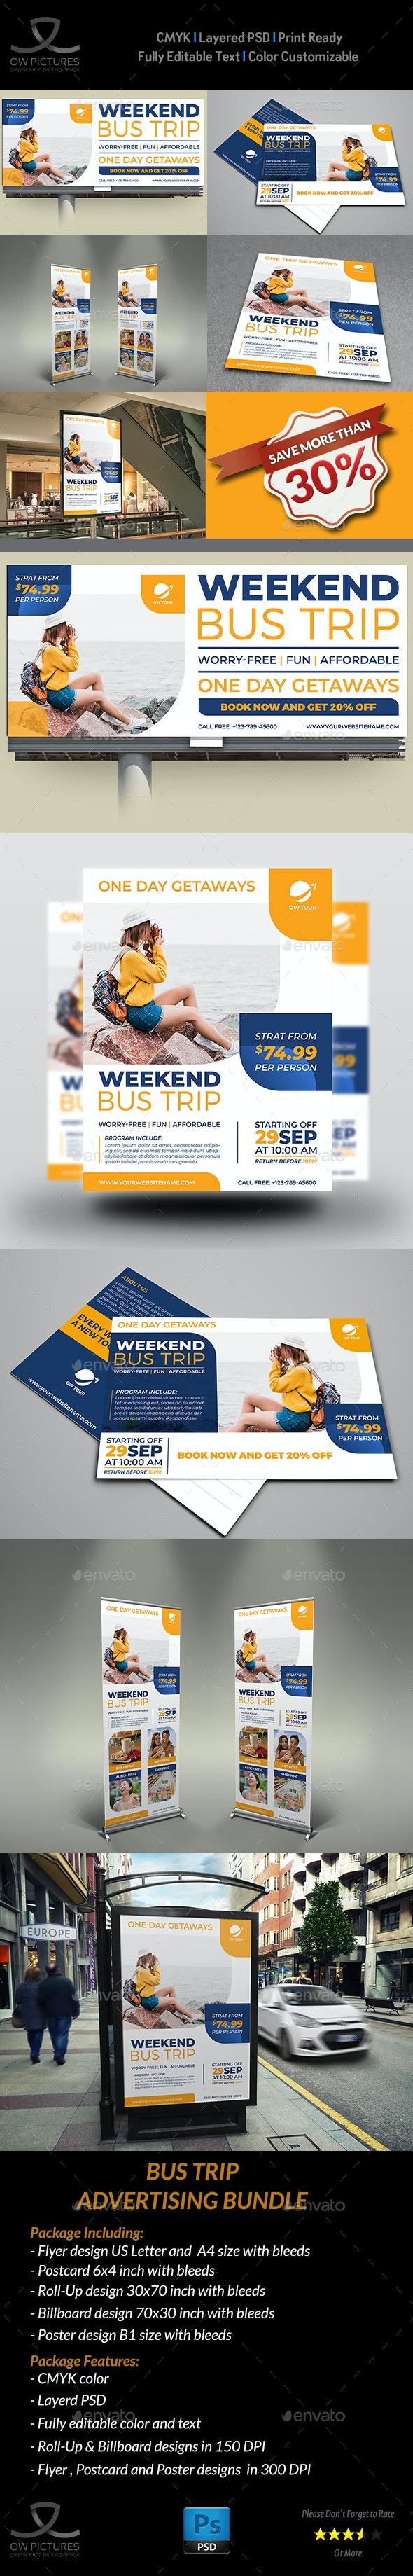 Bus Trip Advertising Bundle Template - Signage Print Templates